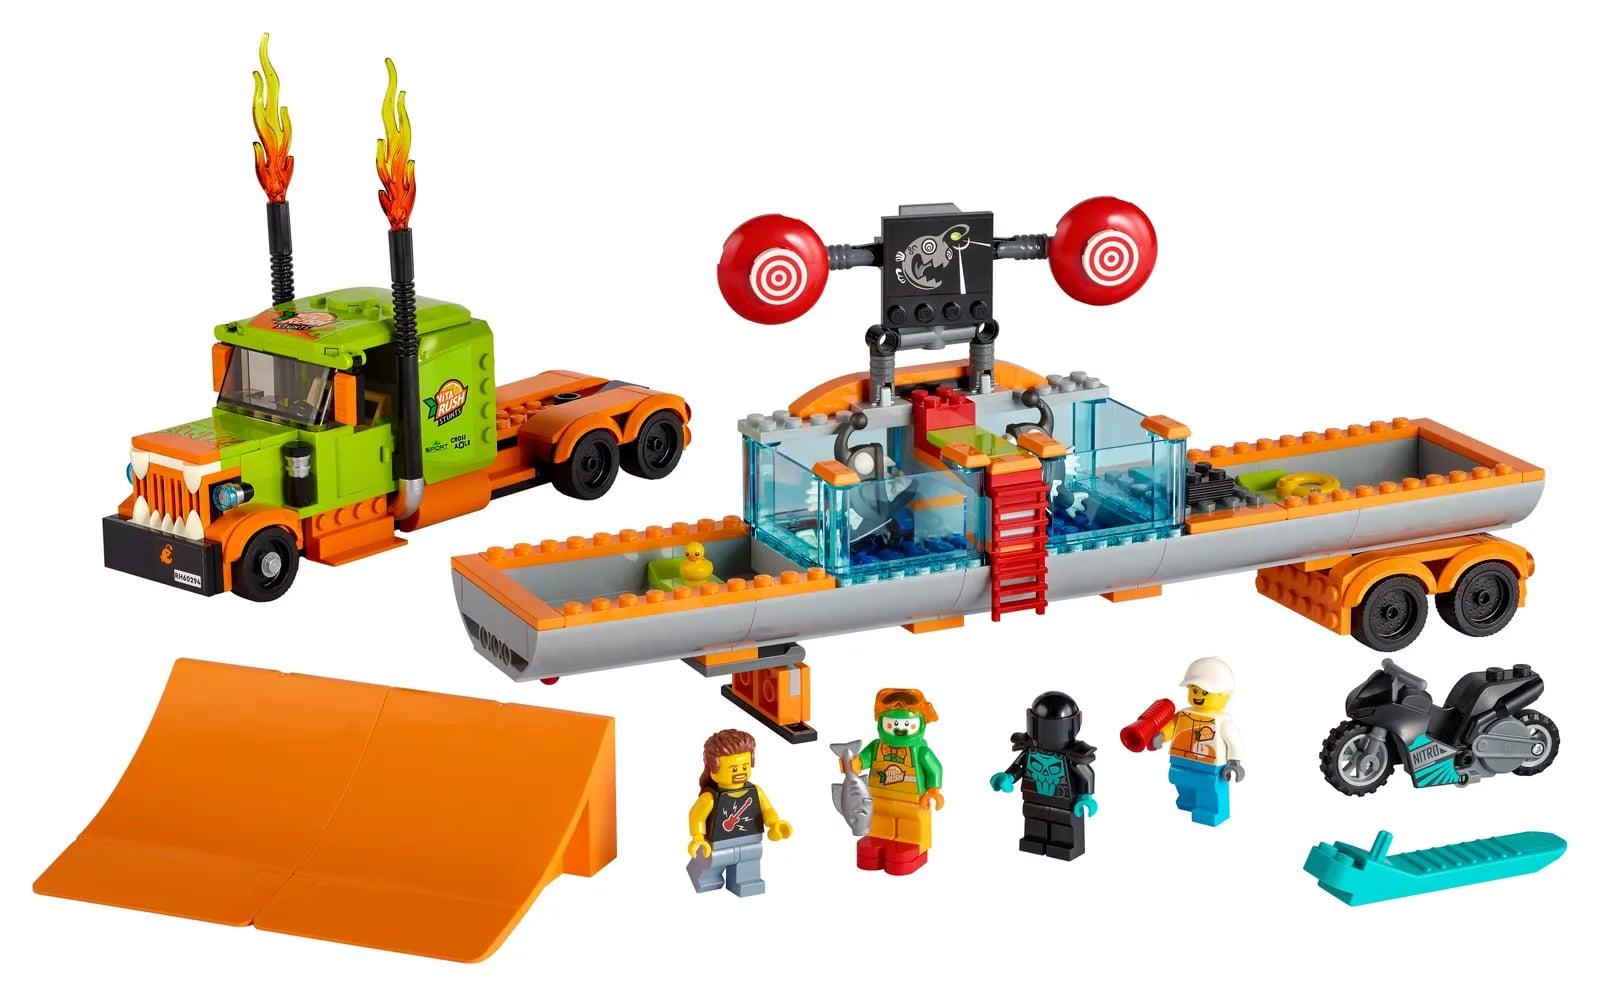 LEGO introduces flywheel-powered bikes with LEGO City Stuntz sets 18